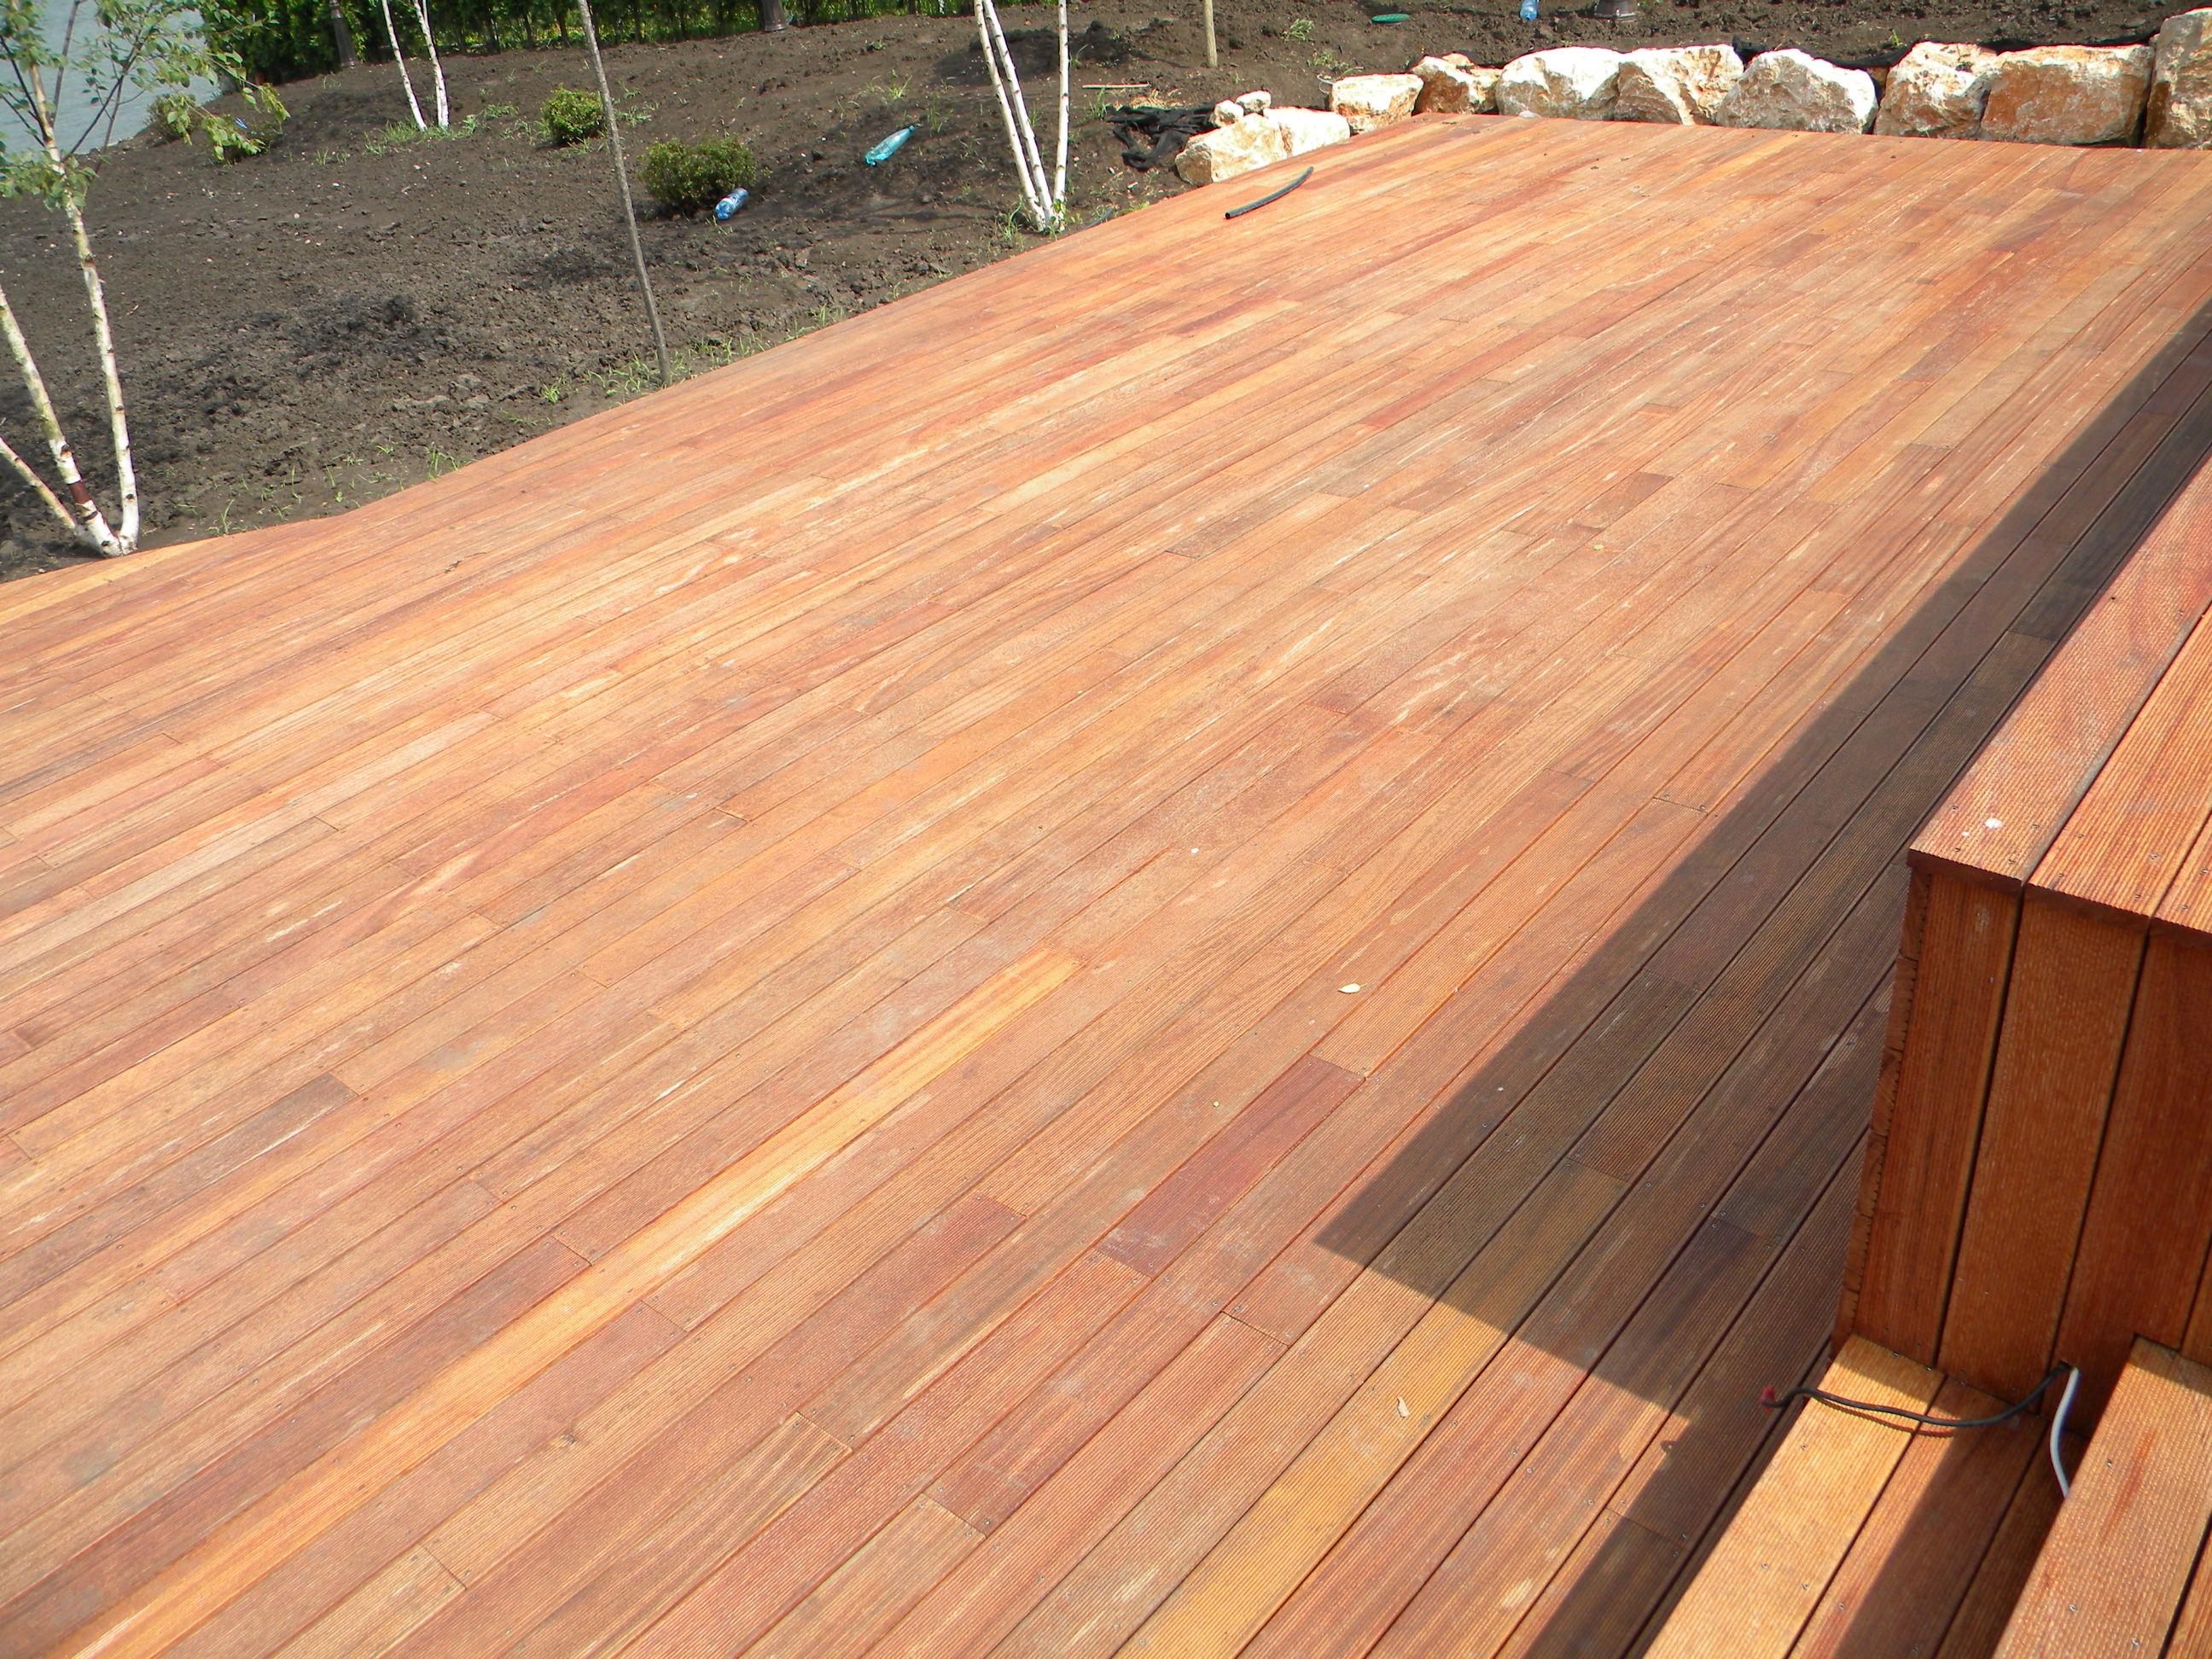 Deck-uri lemn - Angelim Pedra SELVA FLOORS - Poza 8